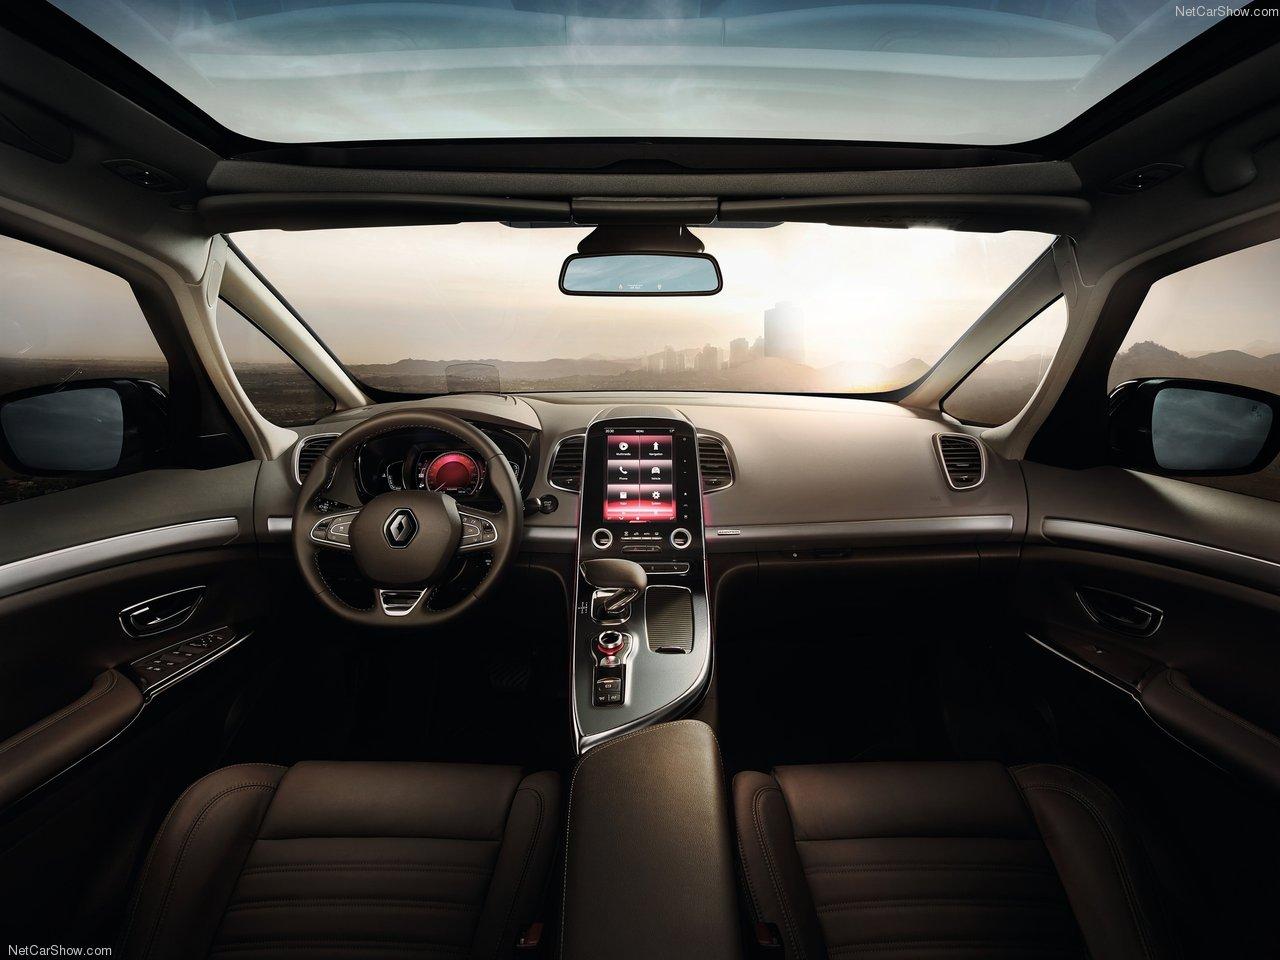 Renault-Espace_2015_1280x960_wallpaper_14.jpg